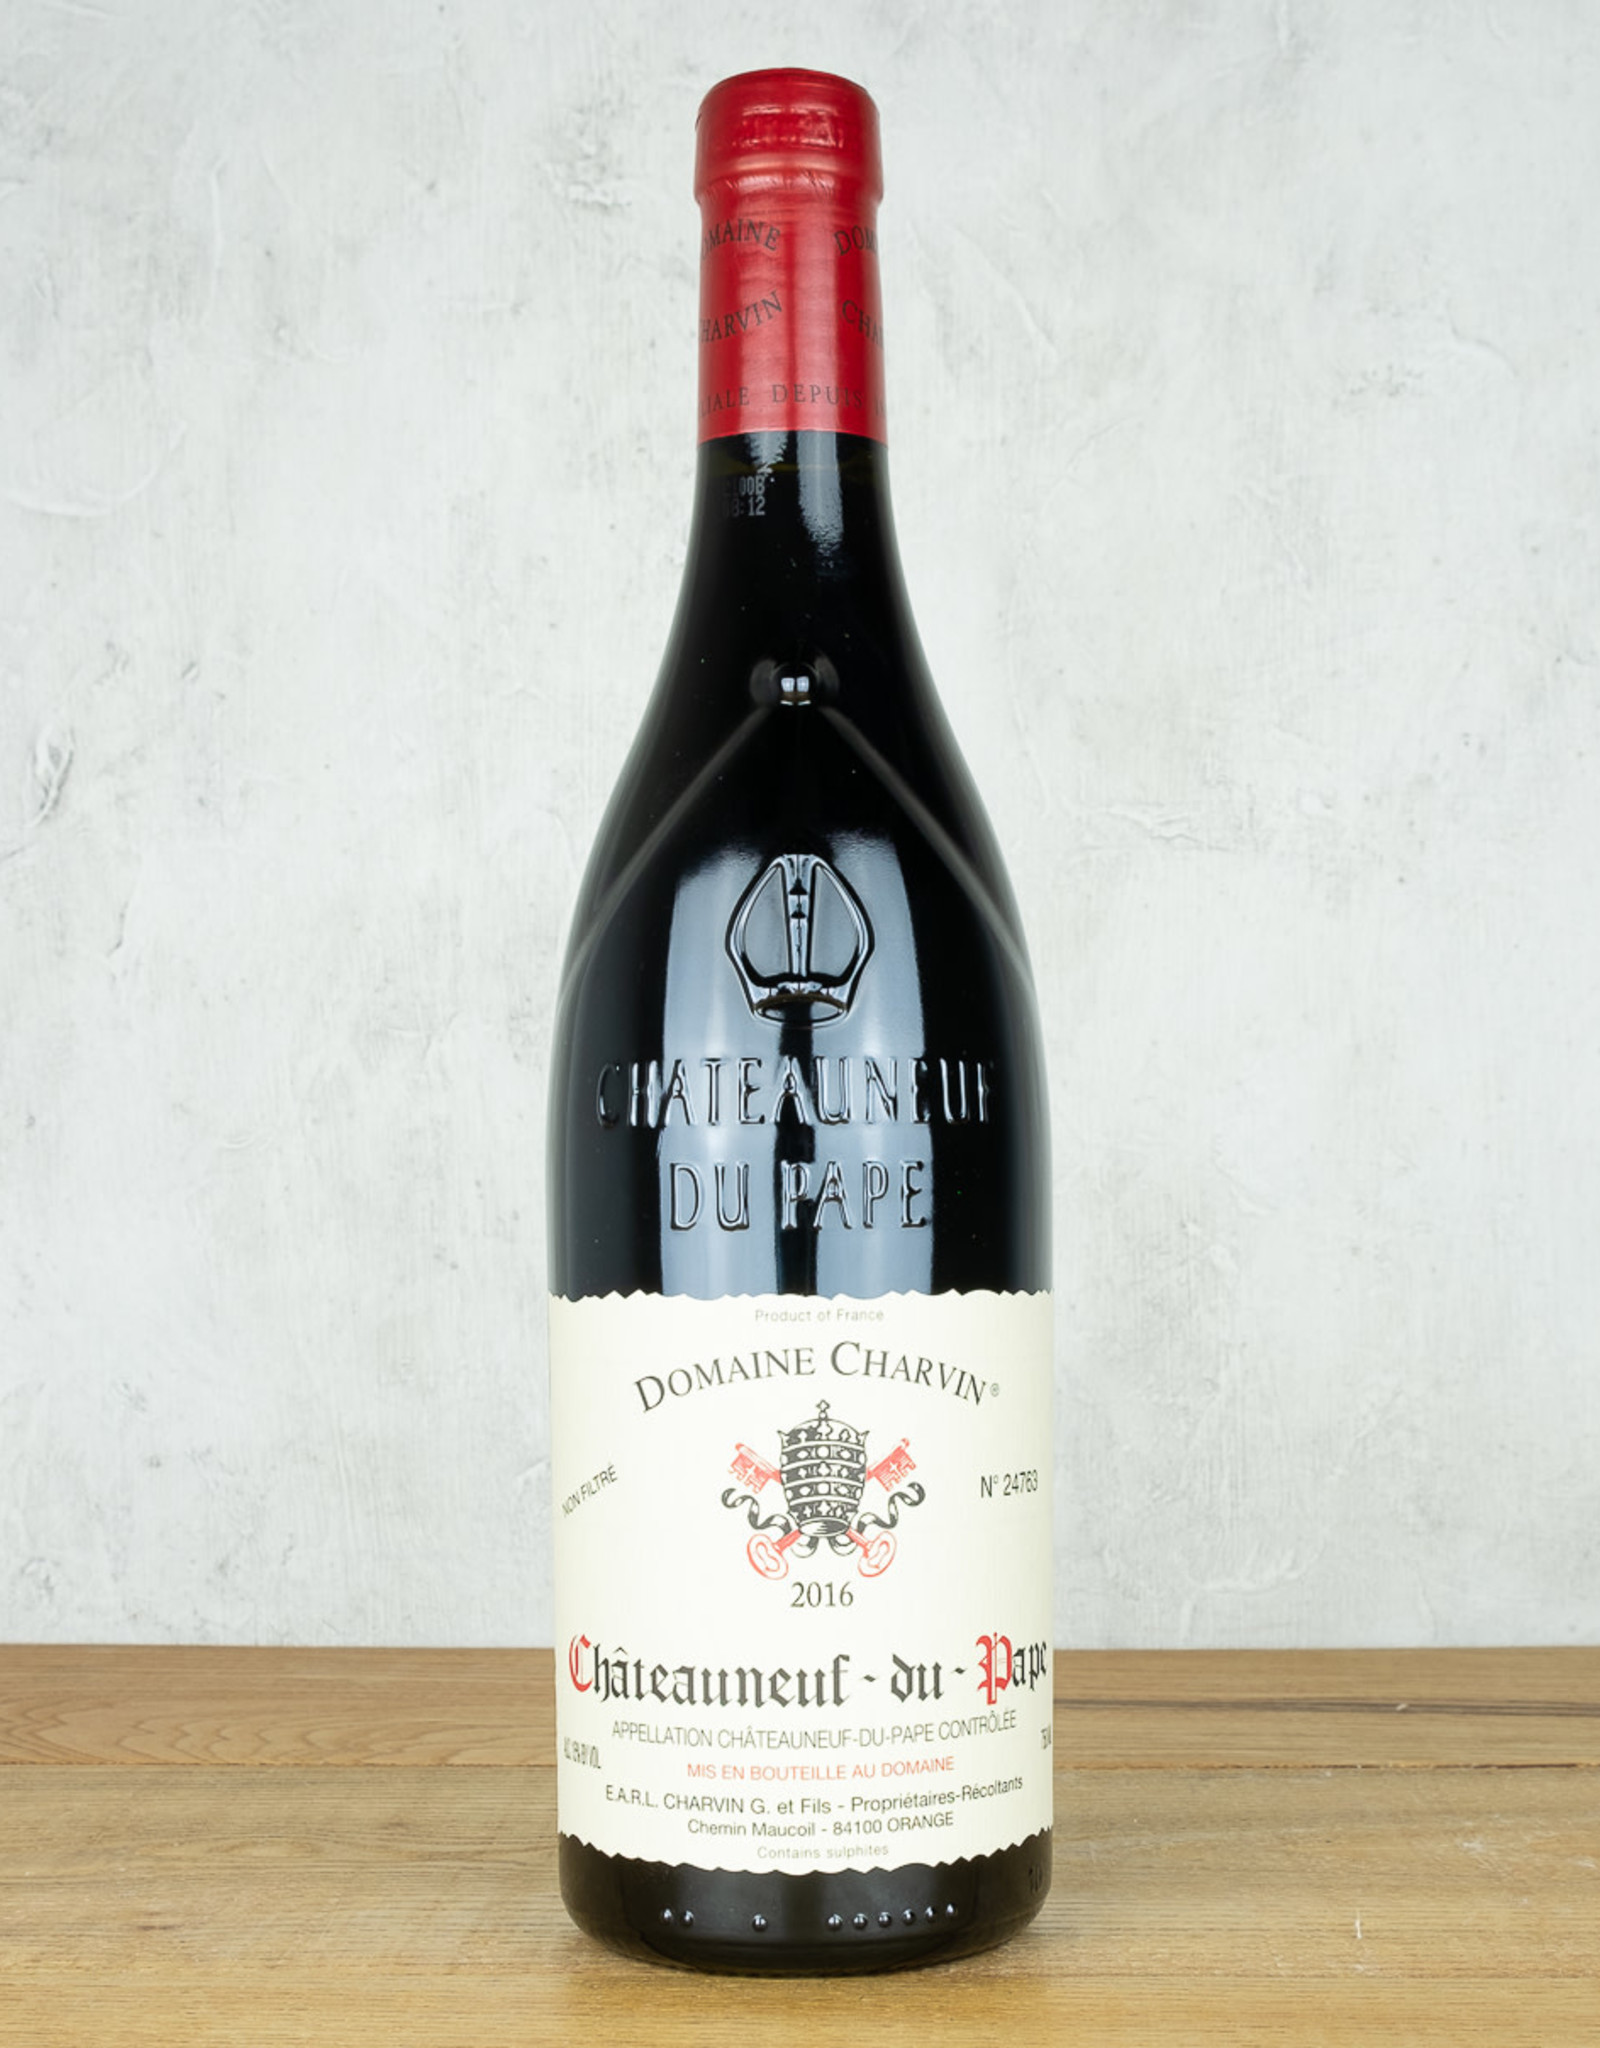 Domaine Charvin Chateauneuf Du Pape